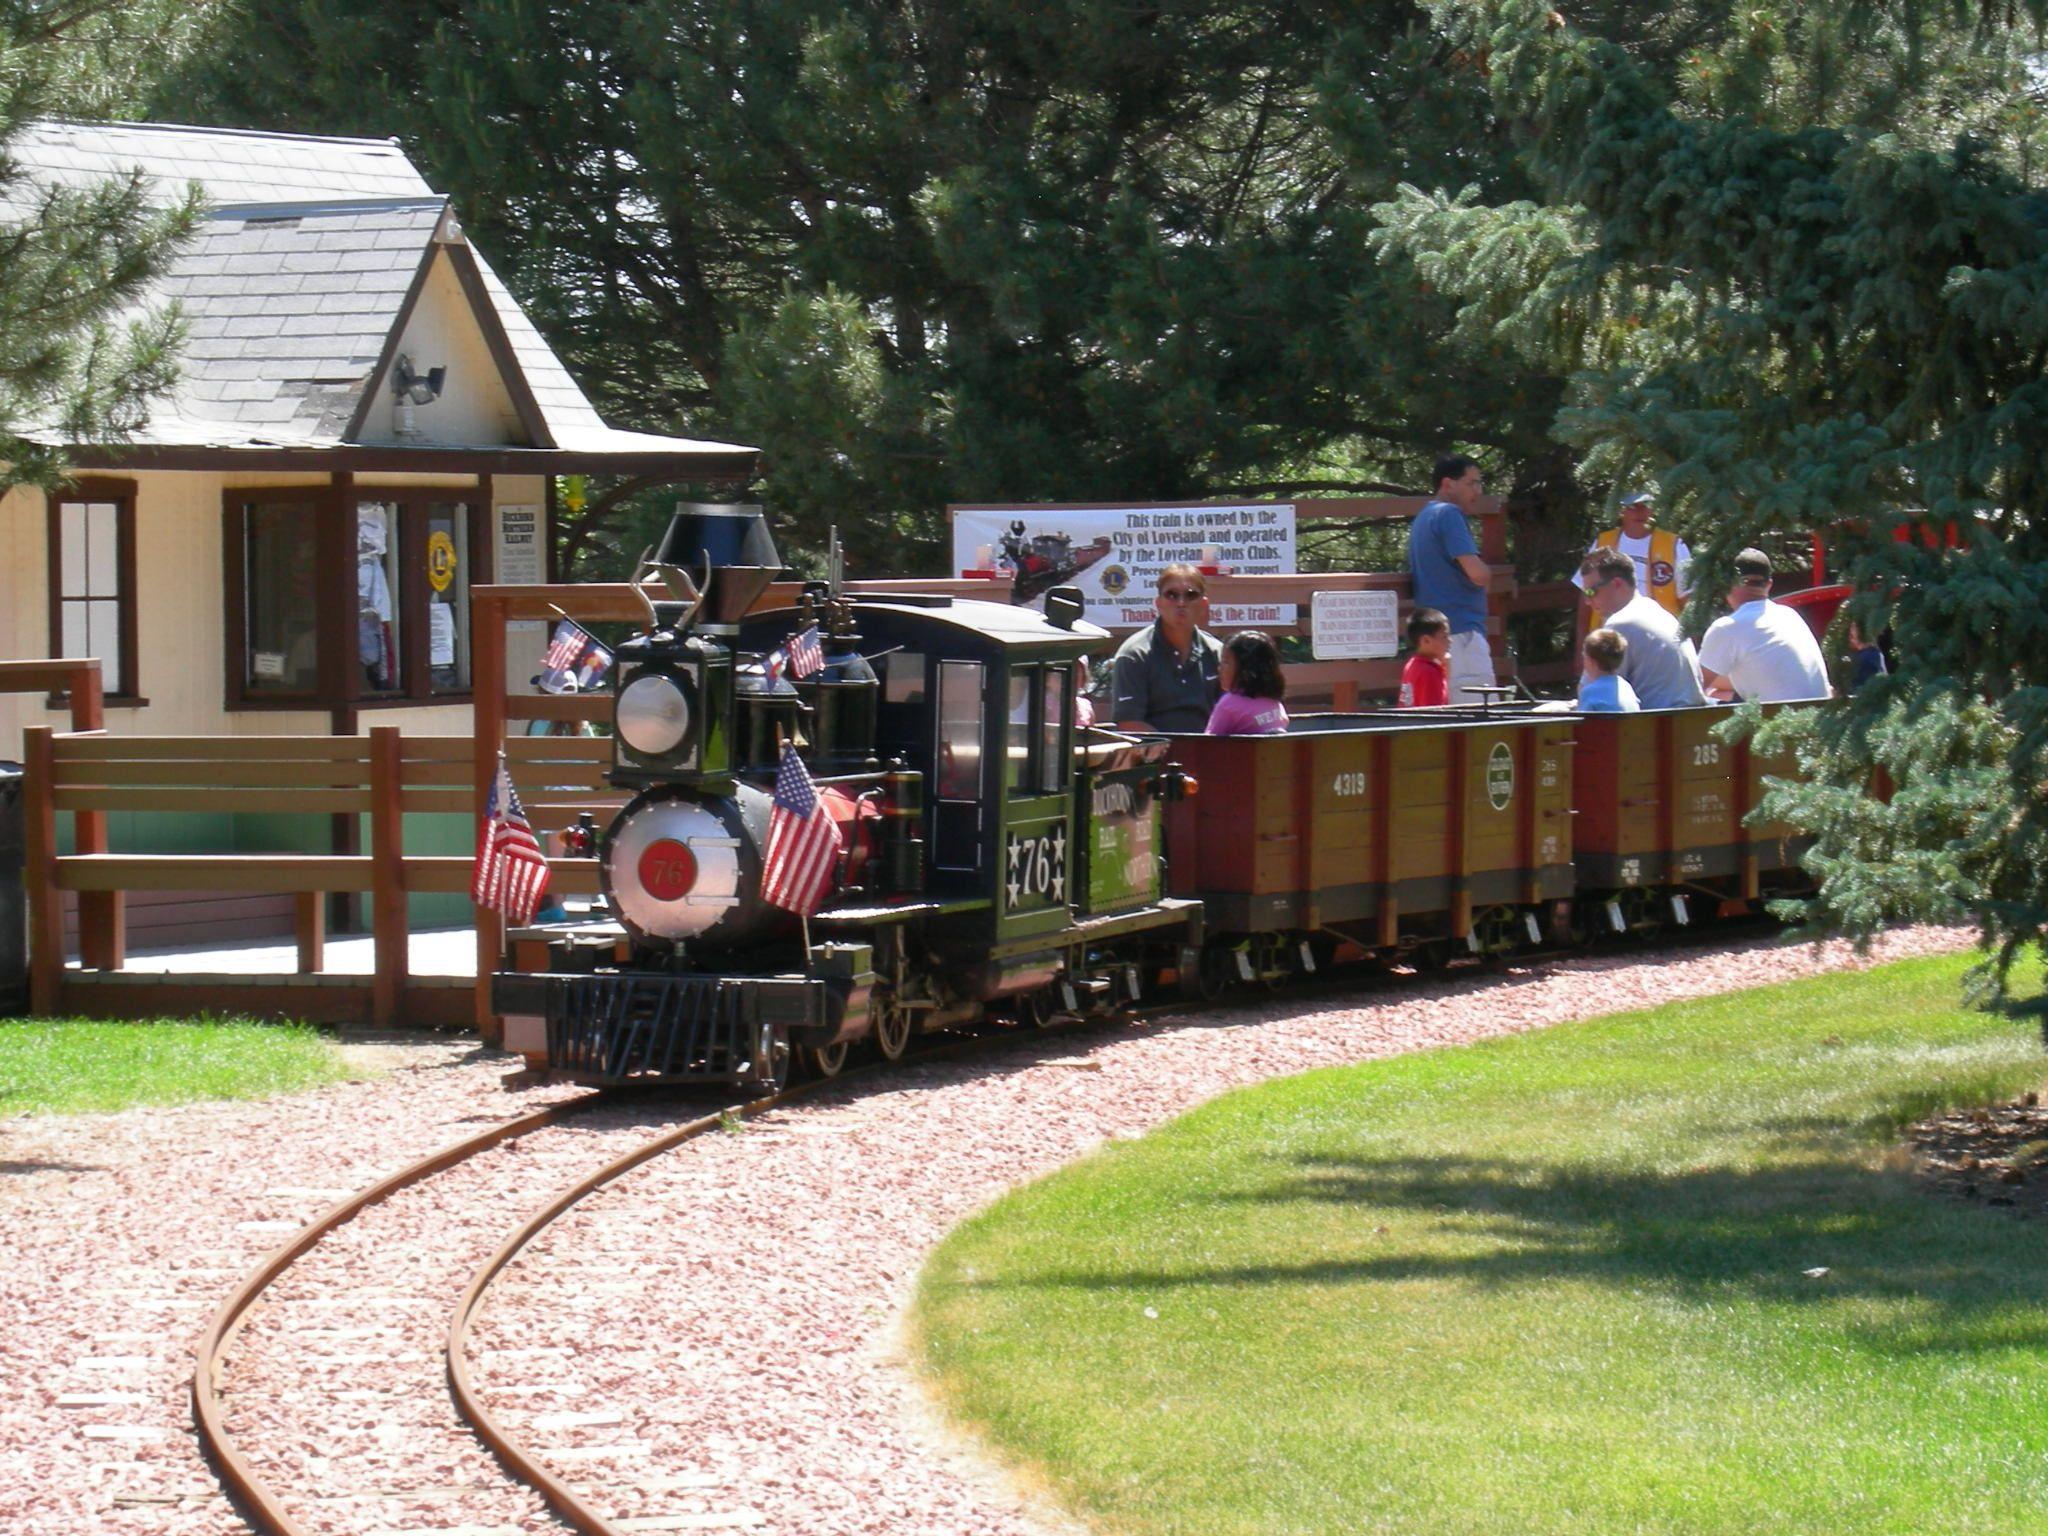 Buckhorn Northern Railroad / Miniature Train at North Lake